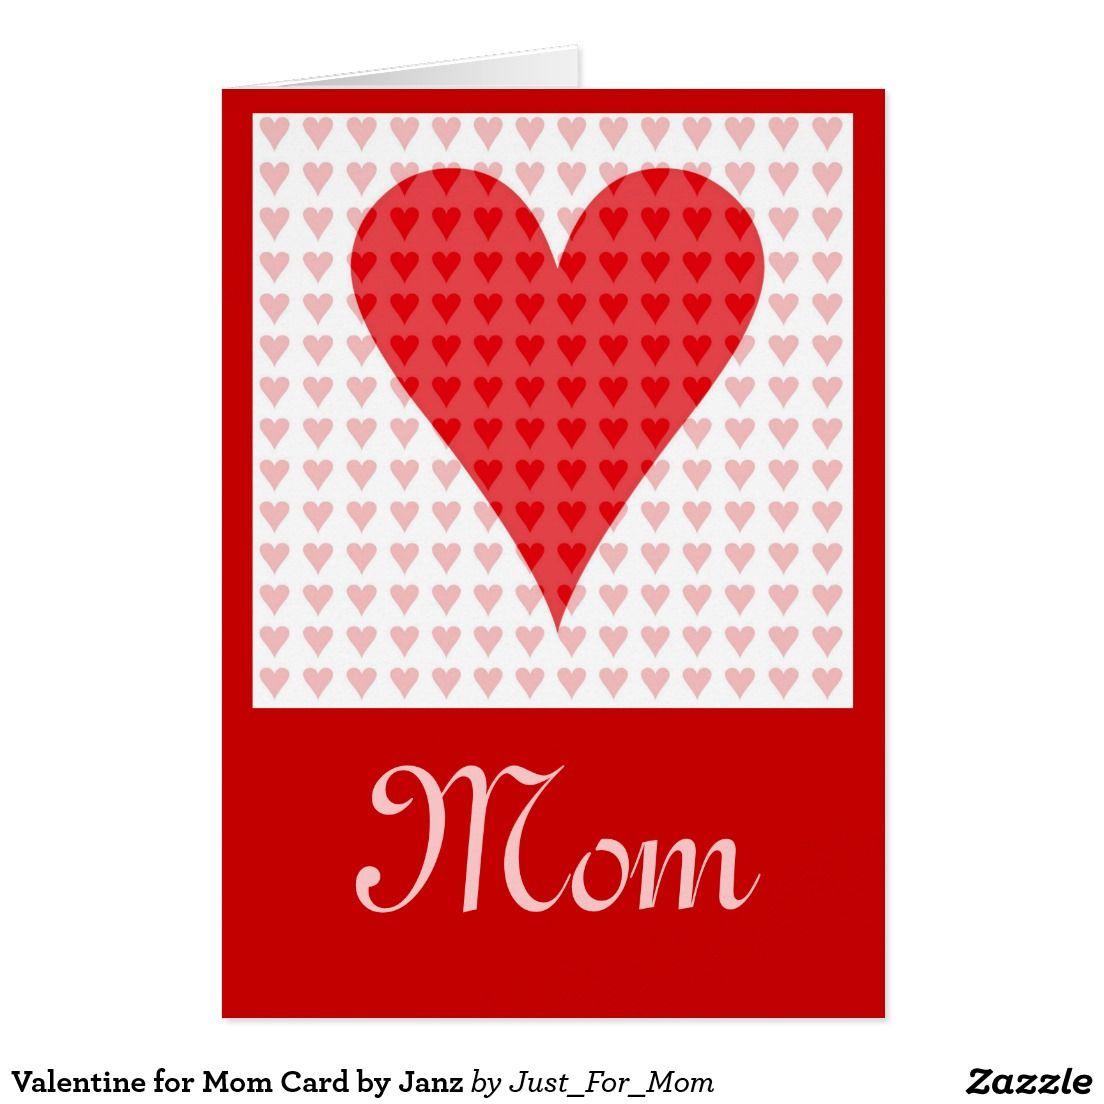 Valentine for Mom Card by Janz